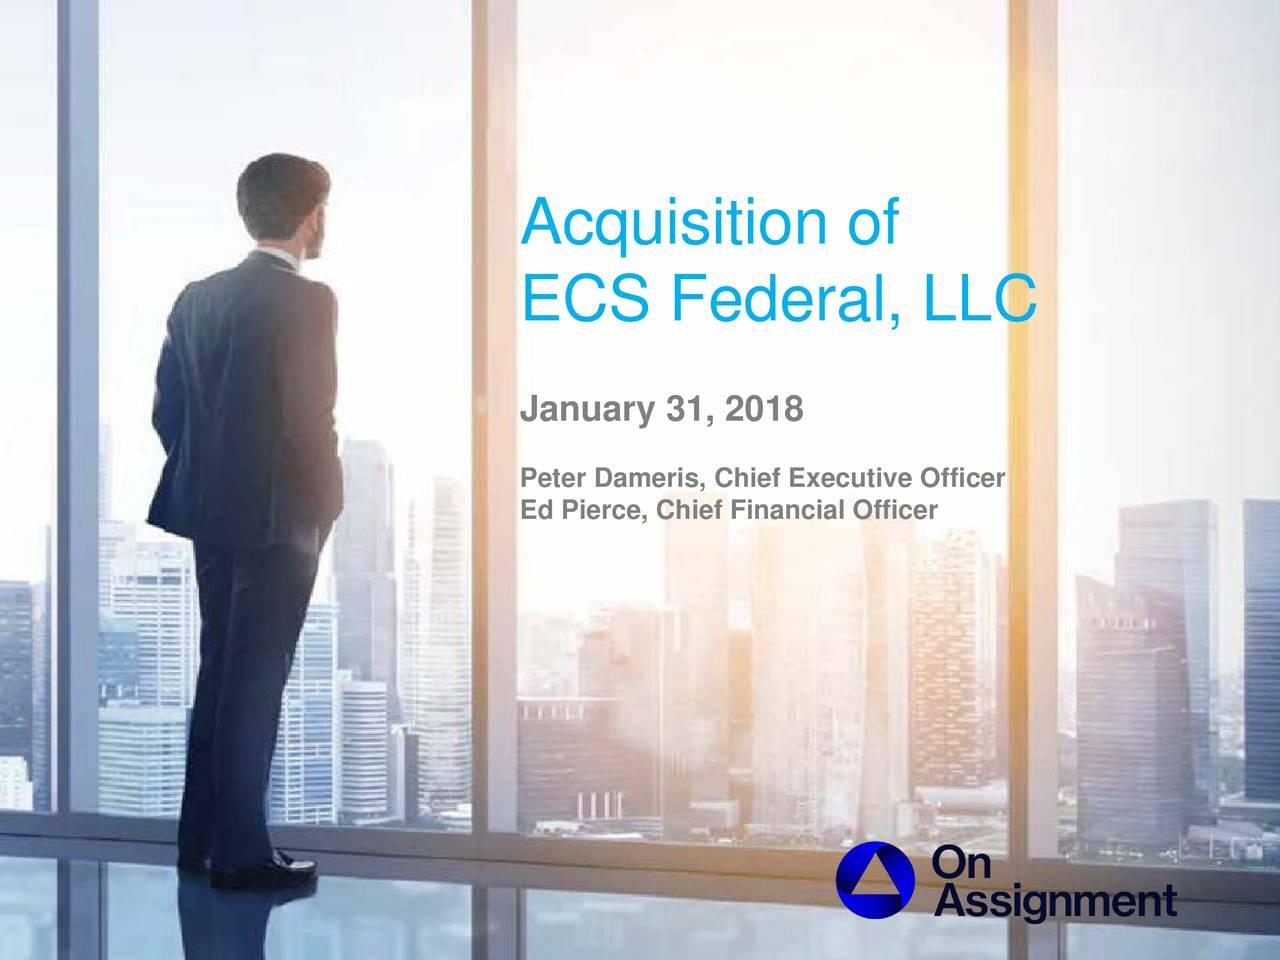 ecs federal llc january 31 2018 peter dameris chief executive officer ed pierce